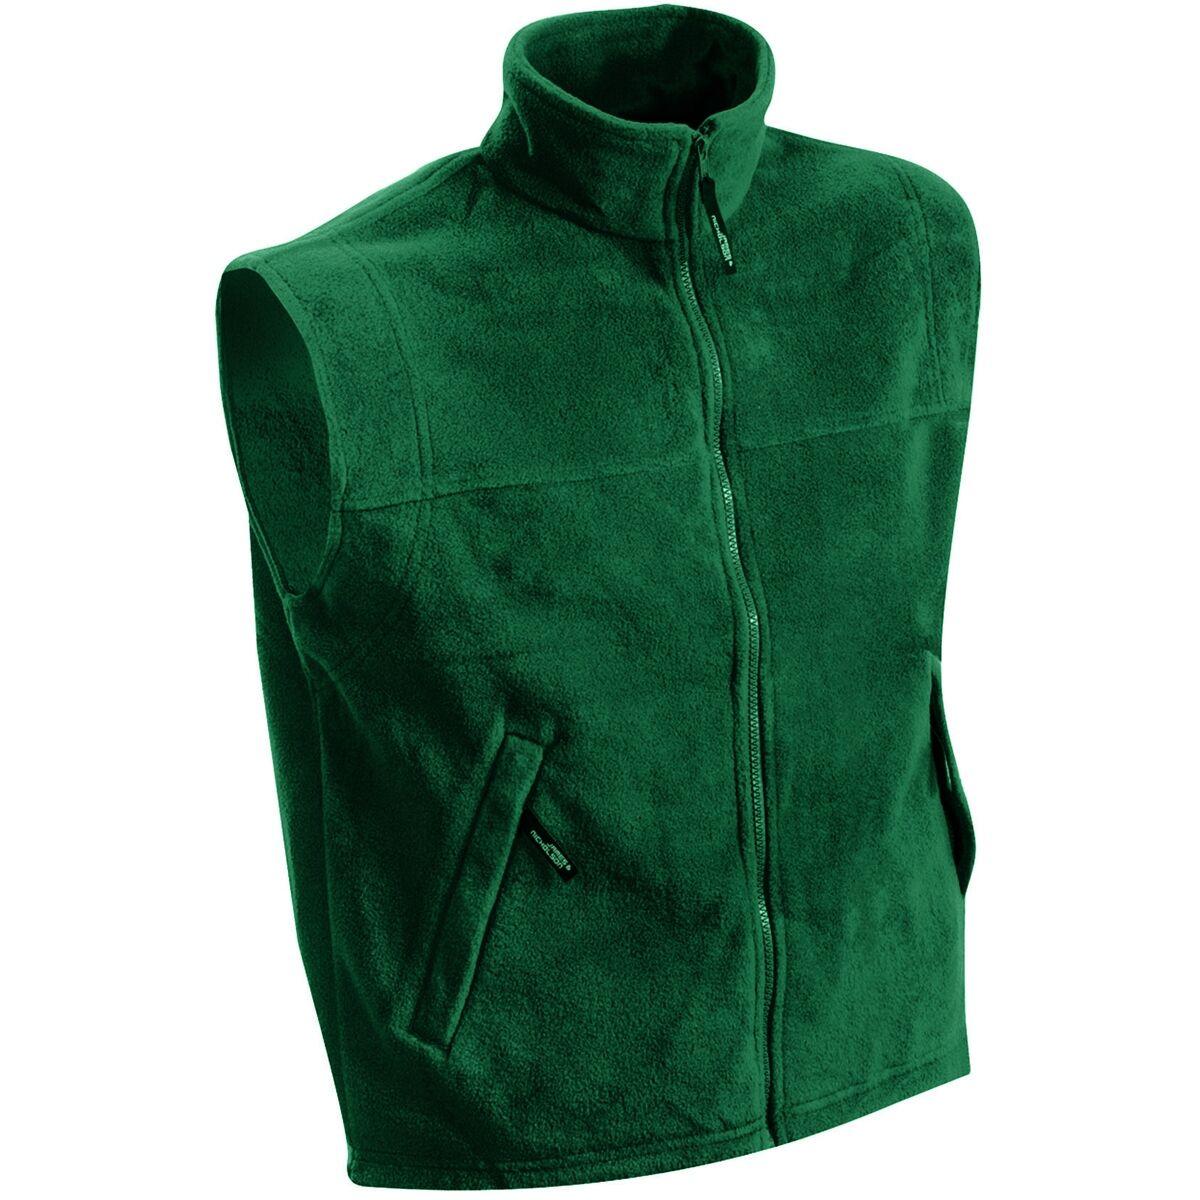 Gilet sans manches bodywarmer polaire homme - JN045 - vert foncé